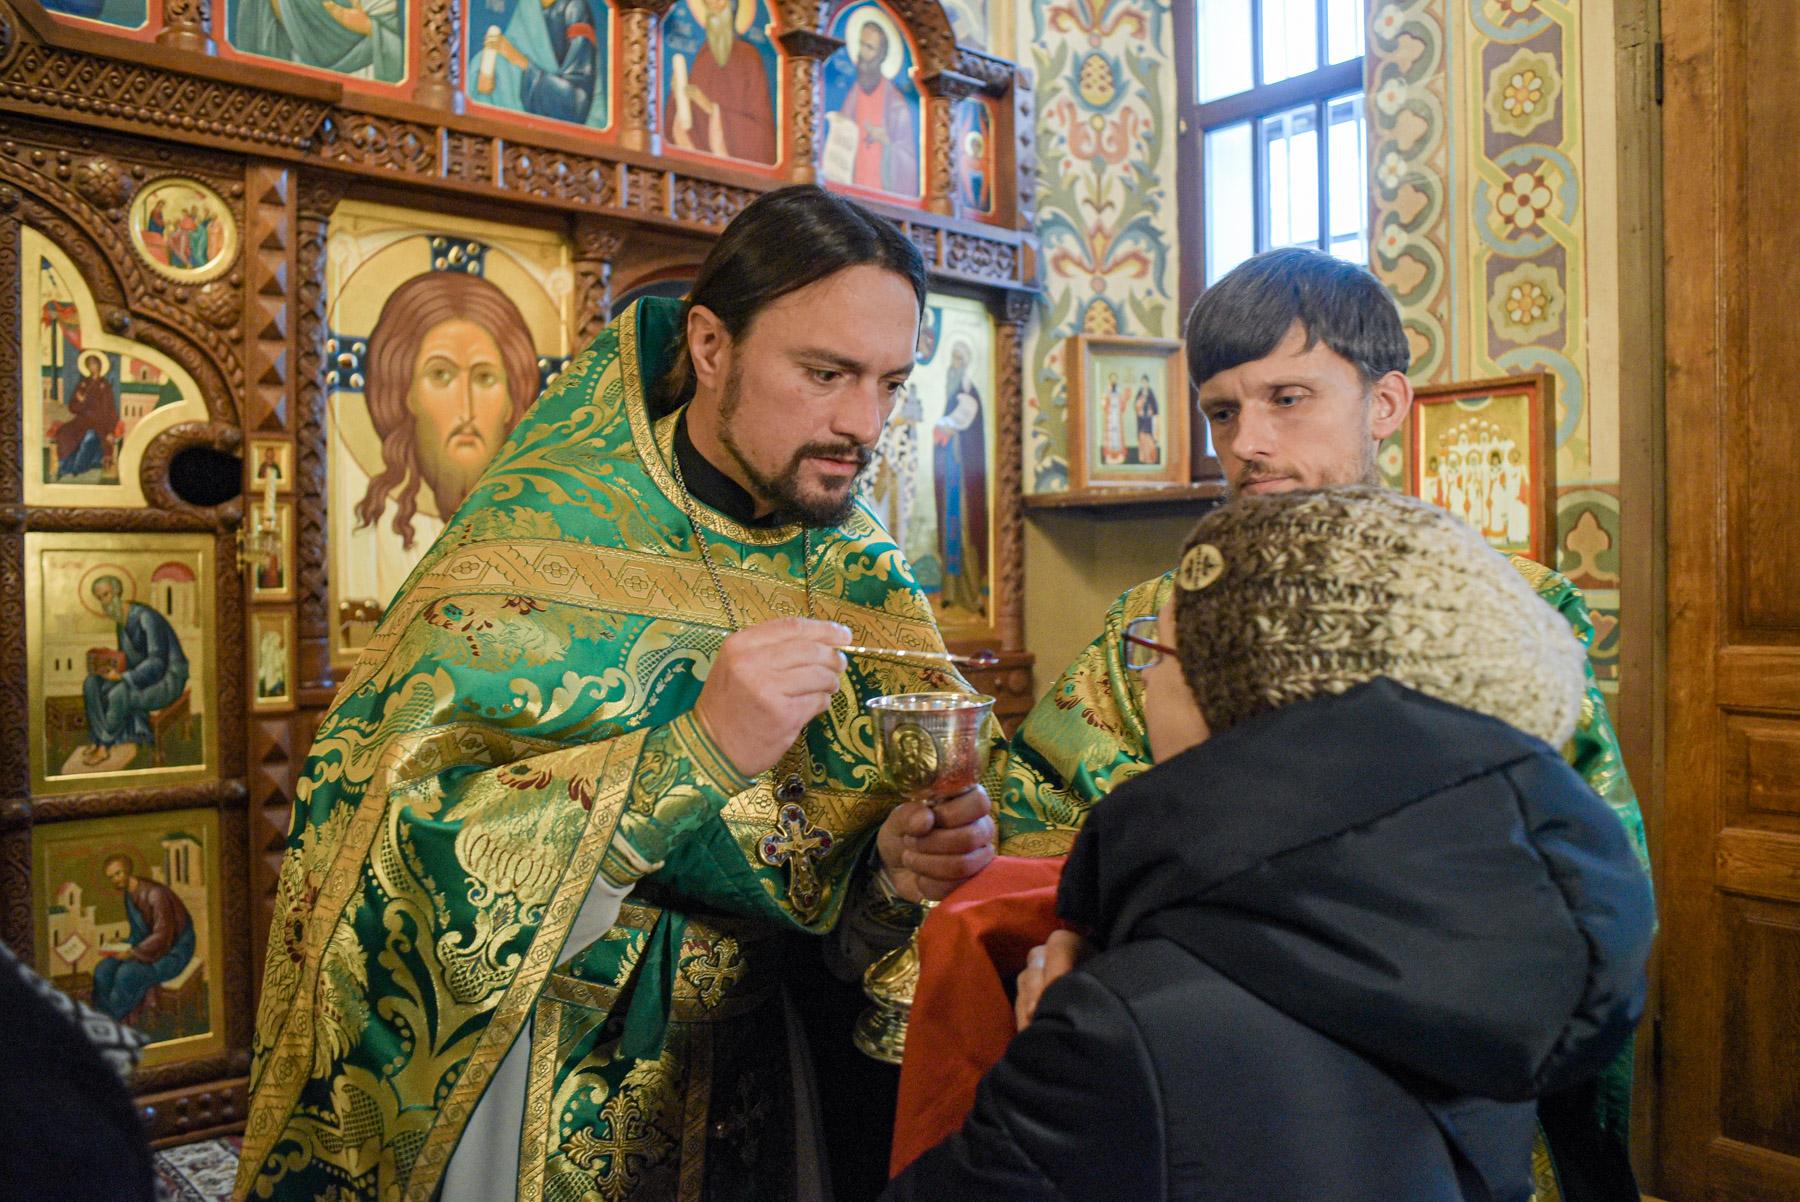 photos of orthodox christmas 0253 1